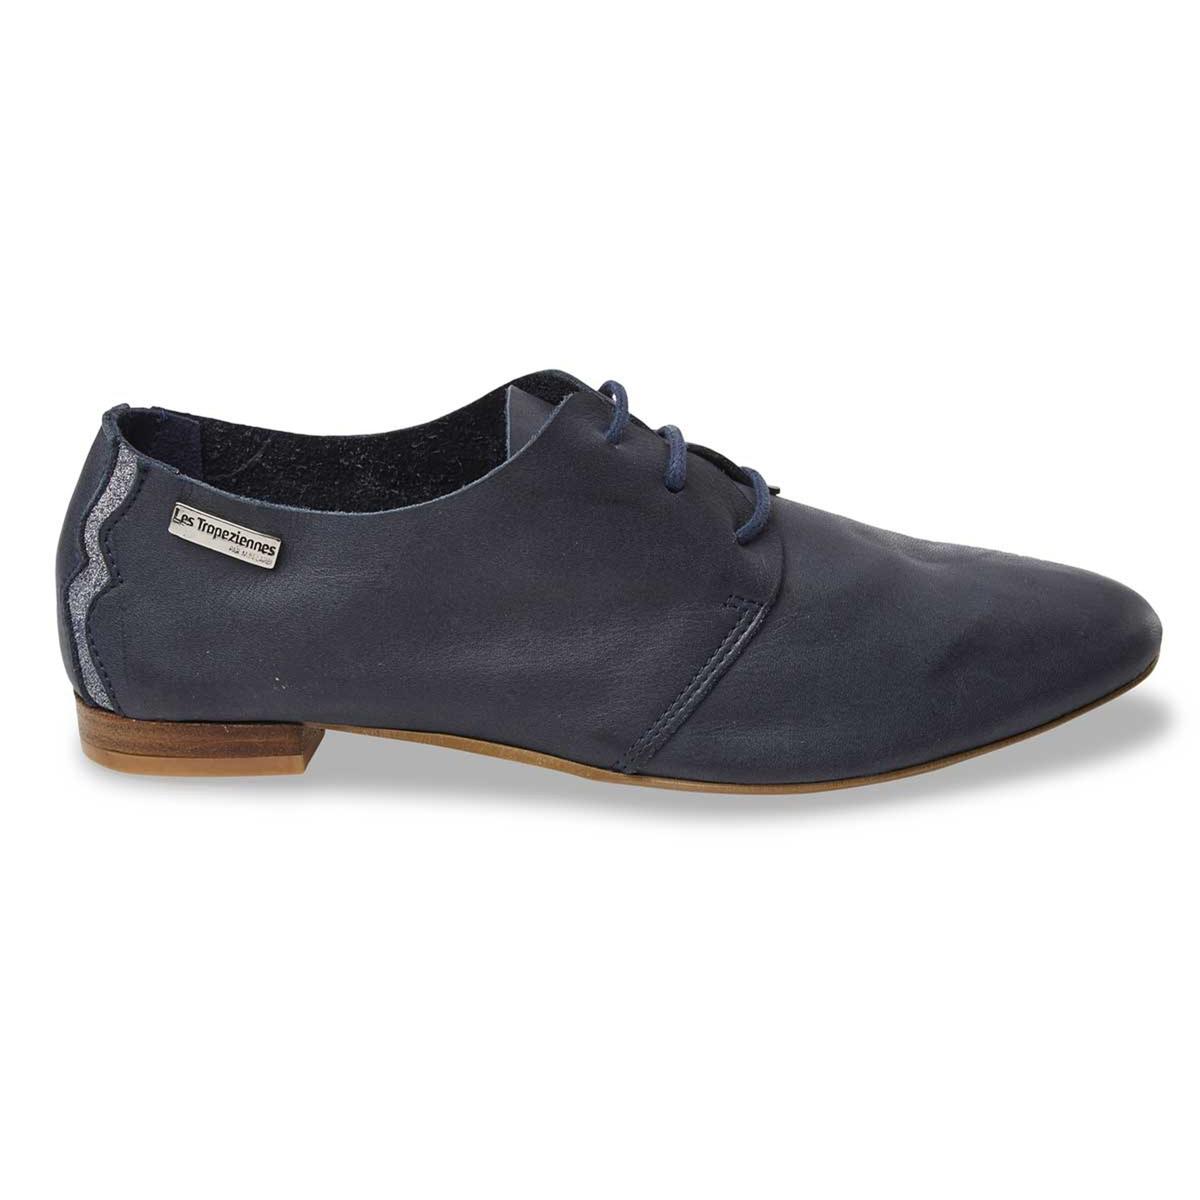 Ботинки-дерби из мягкой кожи Takarika